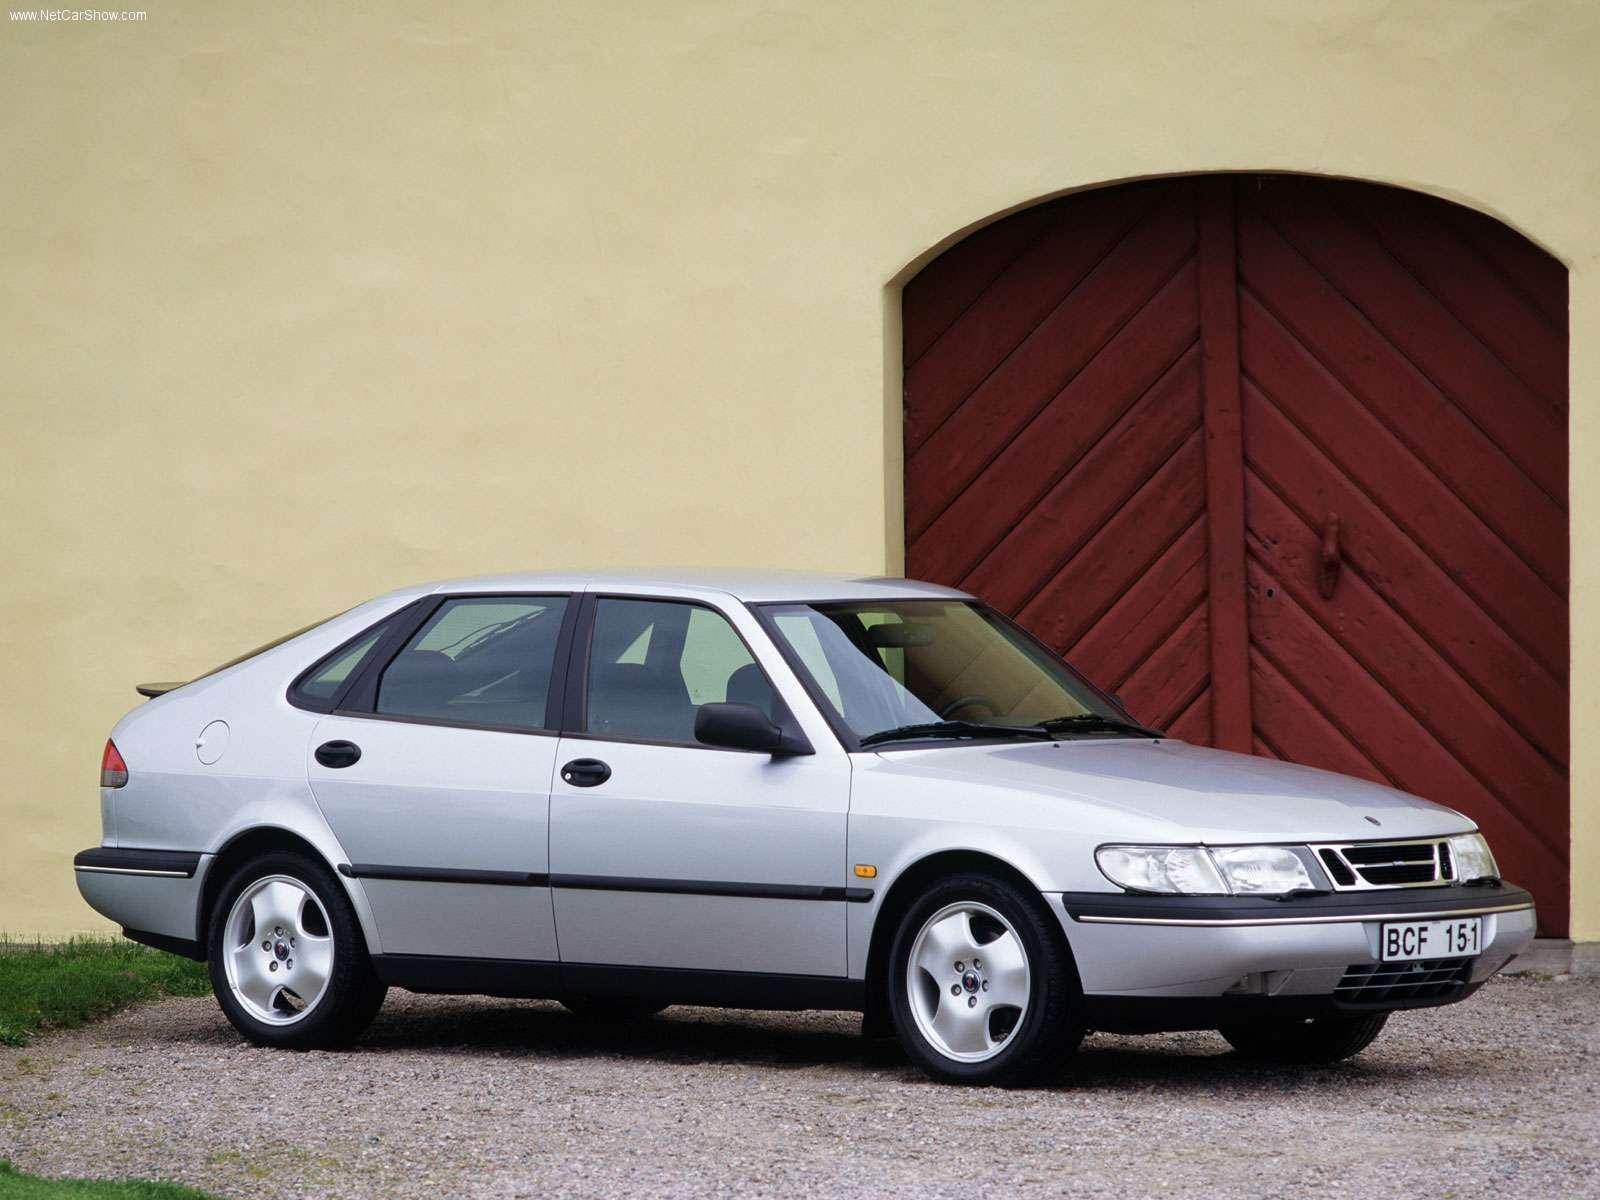 800 1024 1280 1600 origin 1997 Saab 900 ...